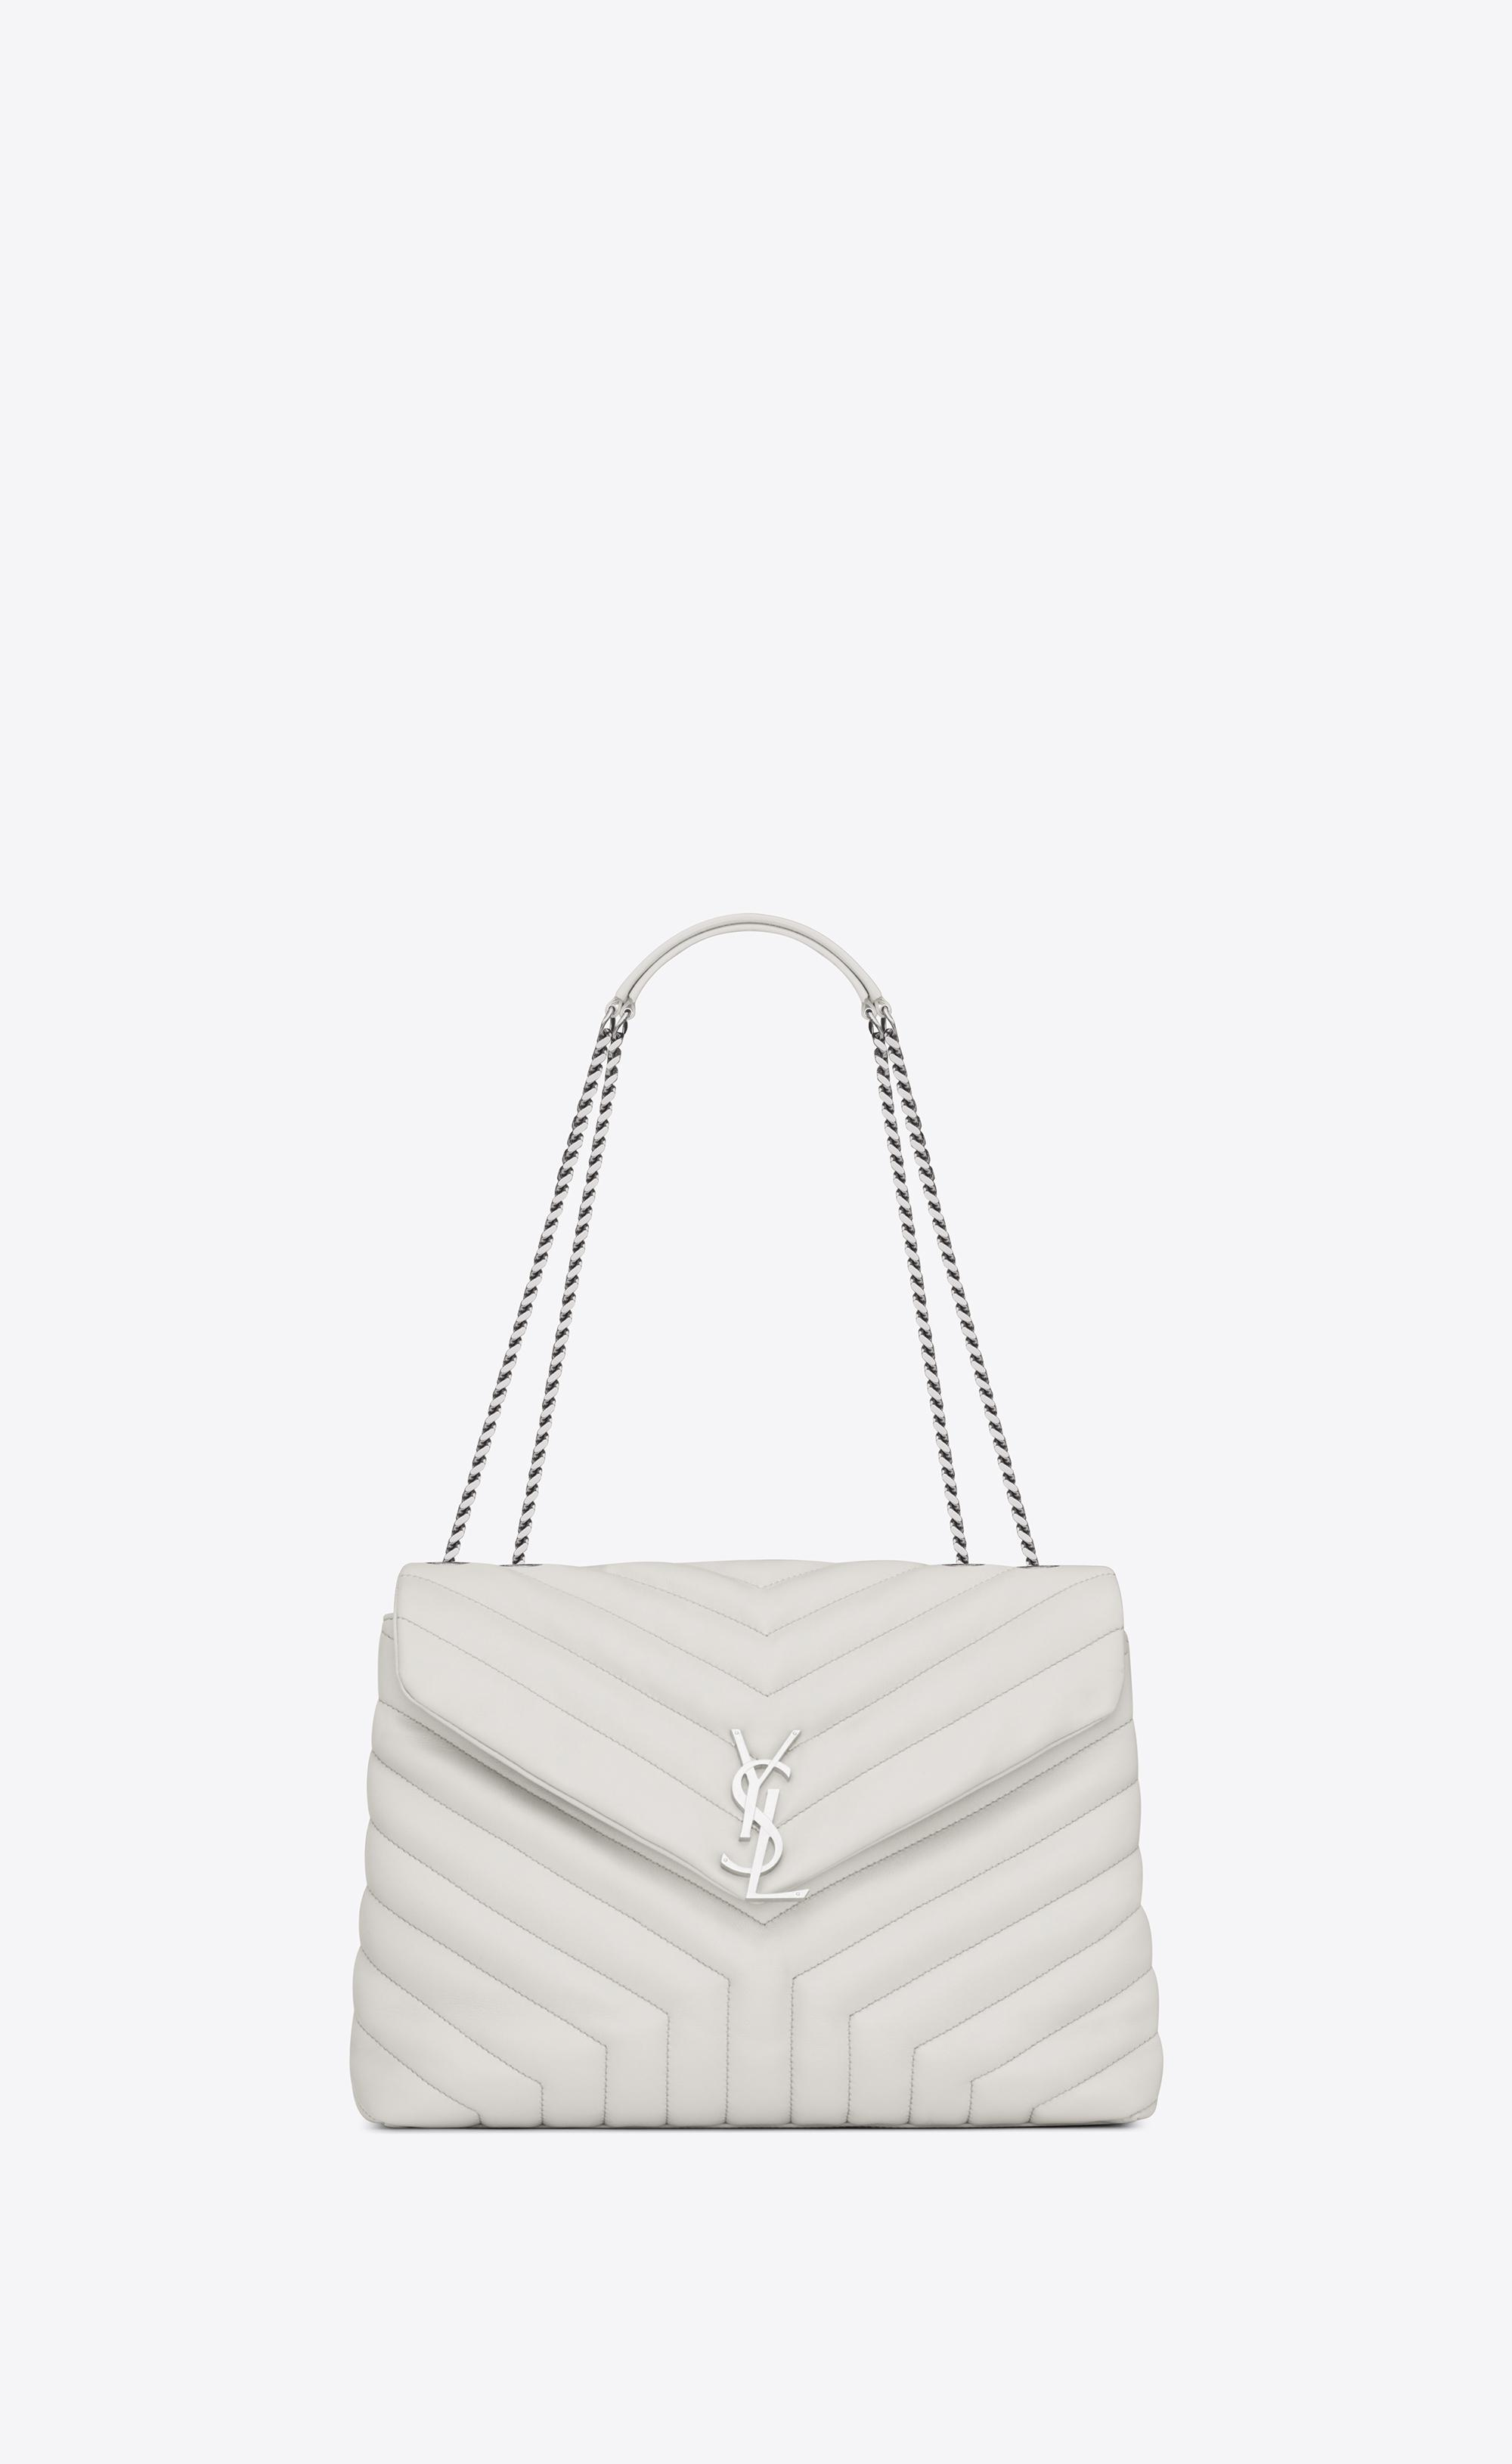 da00d5500 Saint Laurent Medium Loulou Chain Bag In Dove White